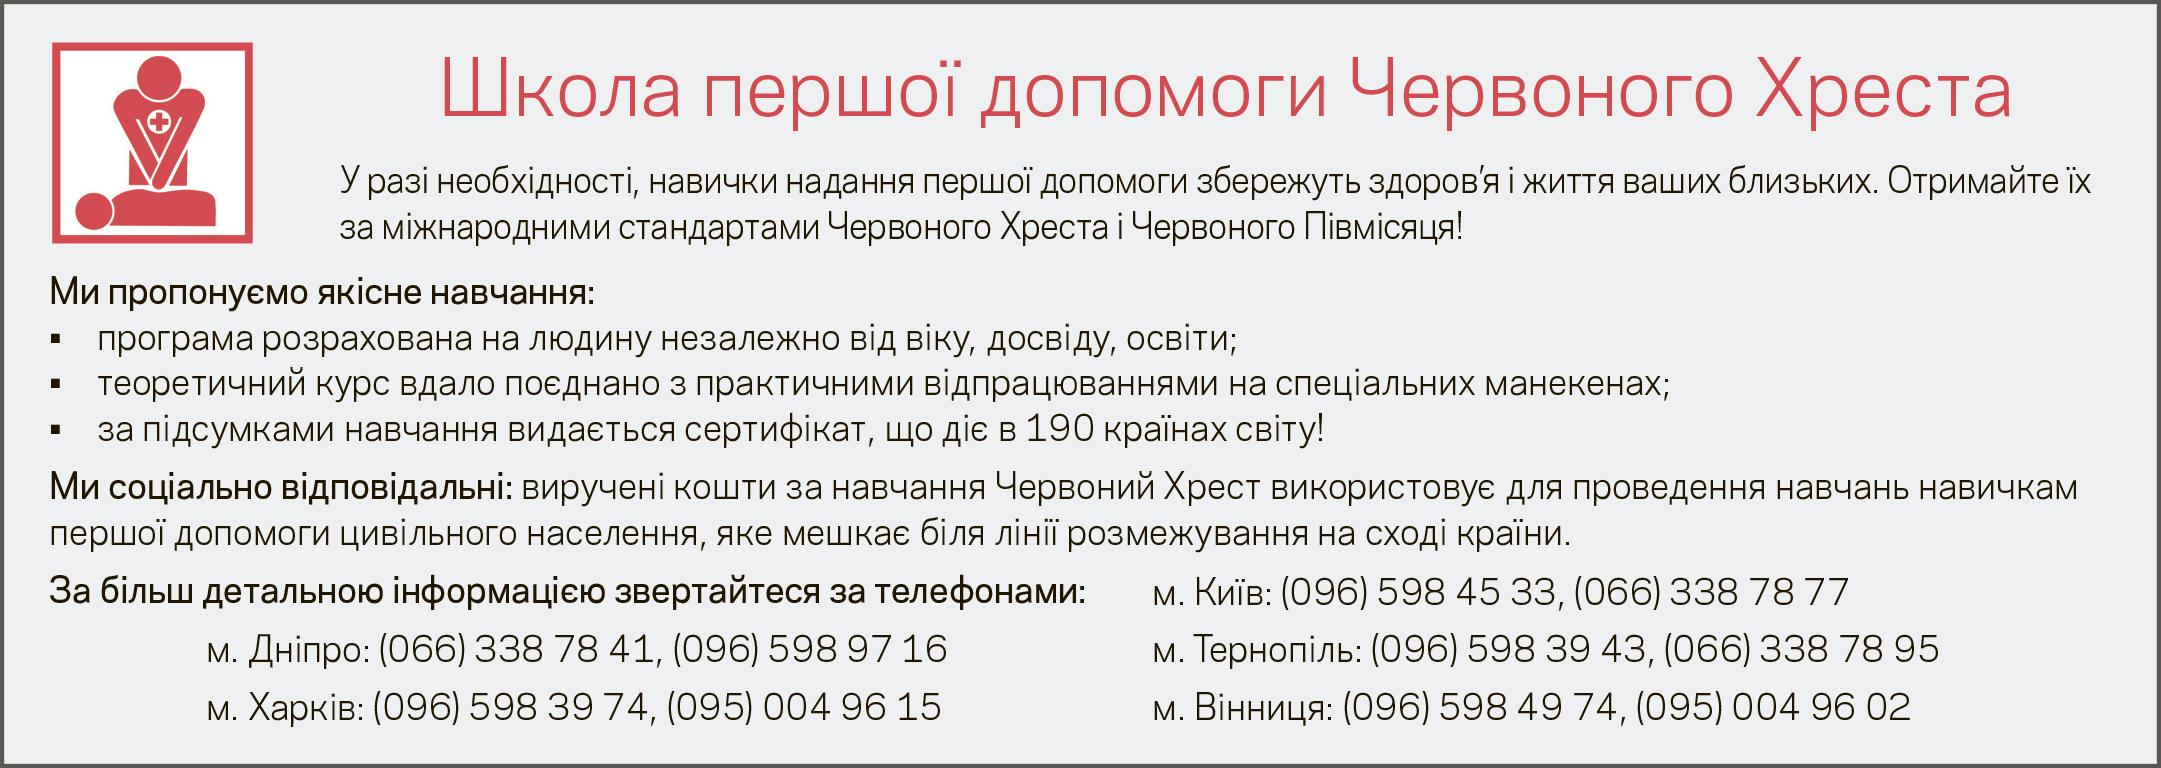 VisnykRCU#2017'03(81)_advert-p09